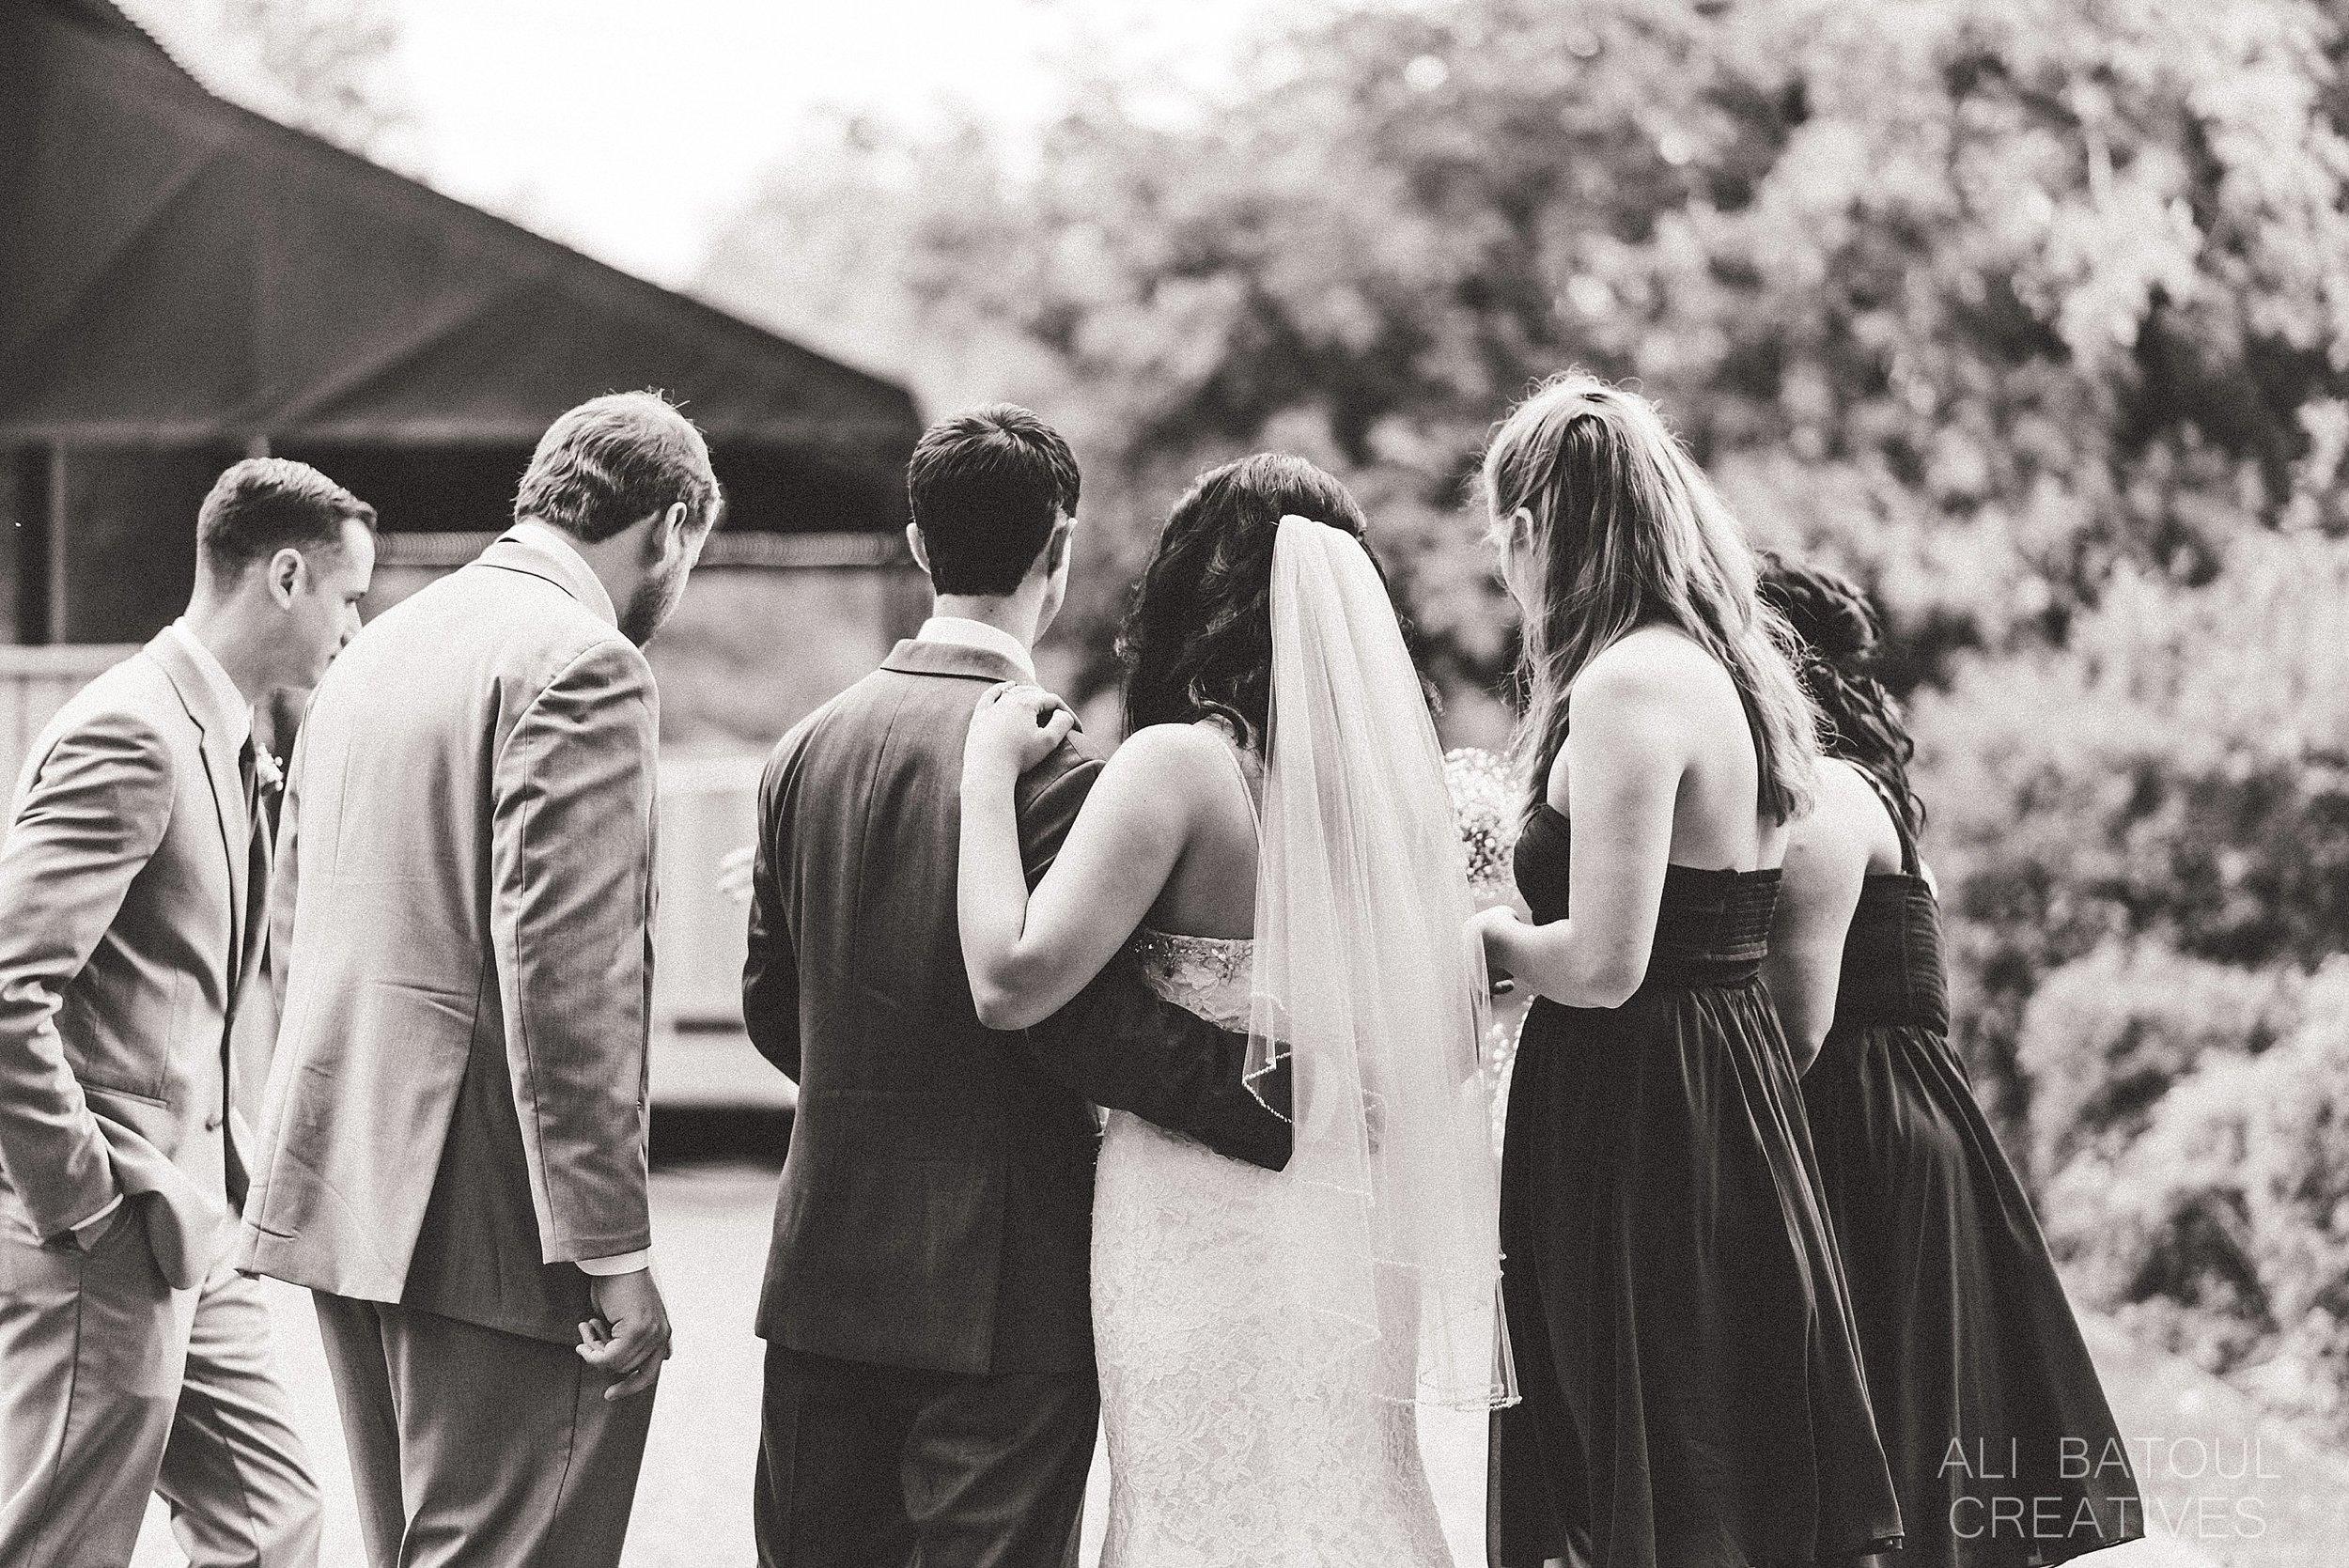 Jocelyn + Steve At The Schoolhouse Wedding - Ali and Batoul Fine Art Wedding Photography_0055.jpg